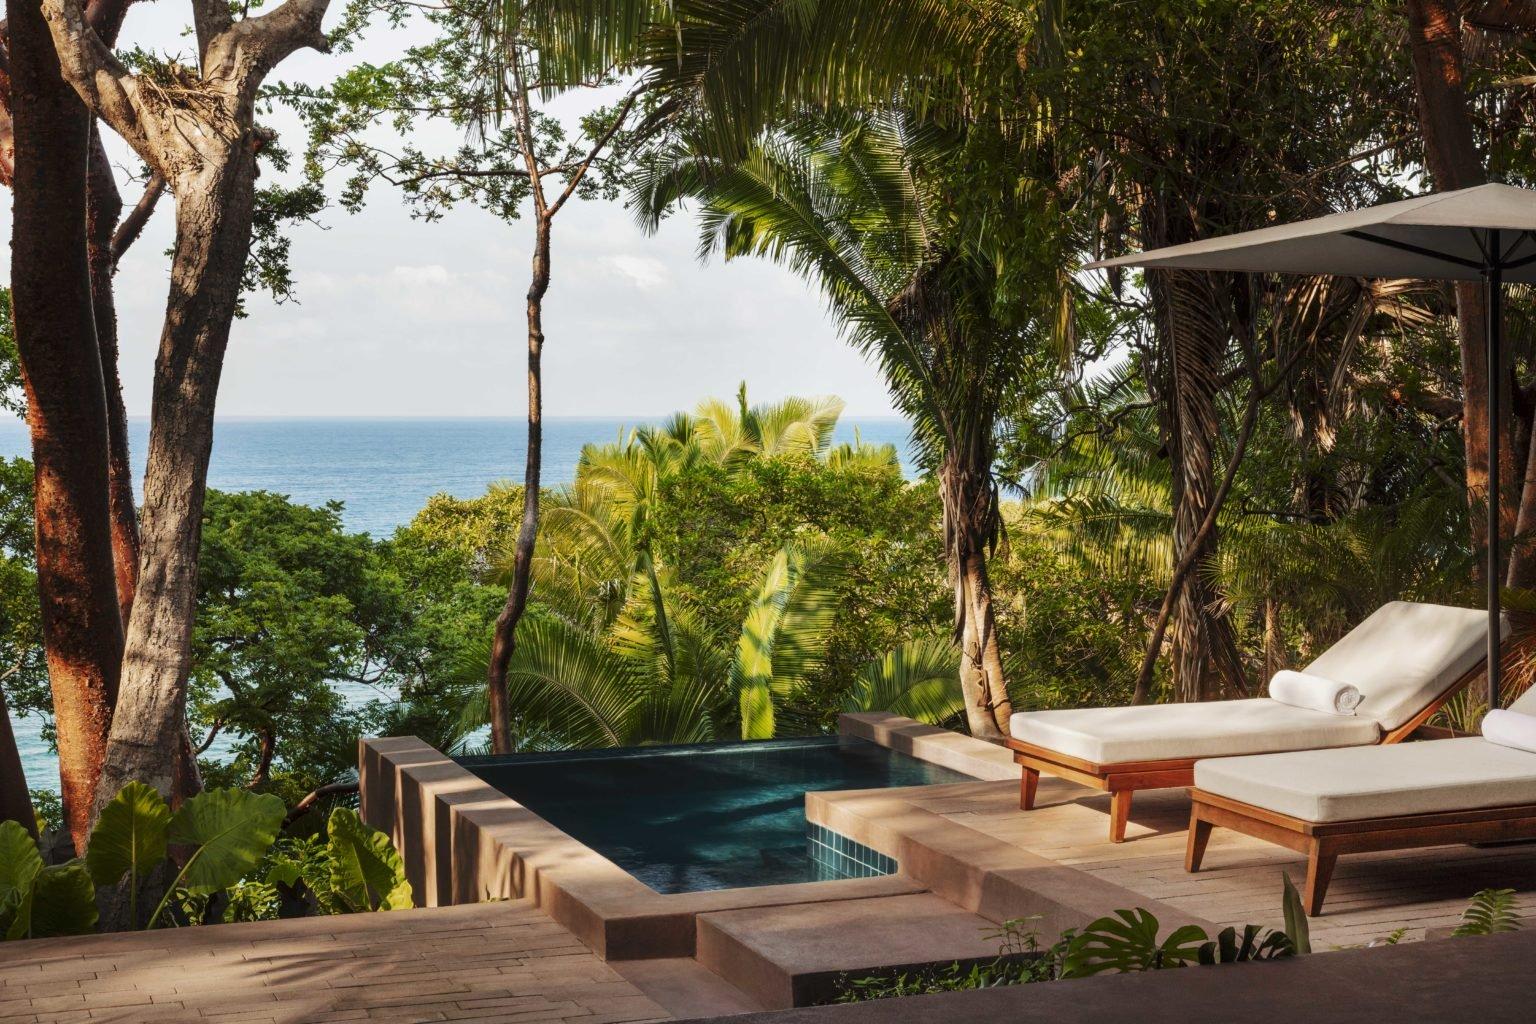 OO_MM_Accommodation_OceanCliffVilla_Terrace_View_8035_MASTER-1536×1024